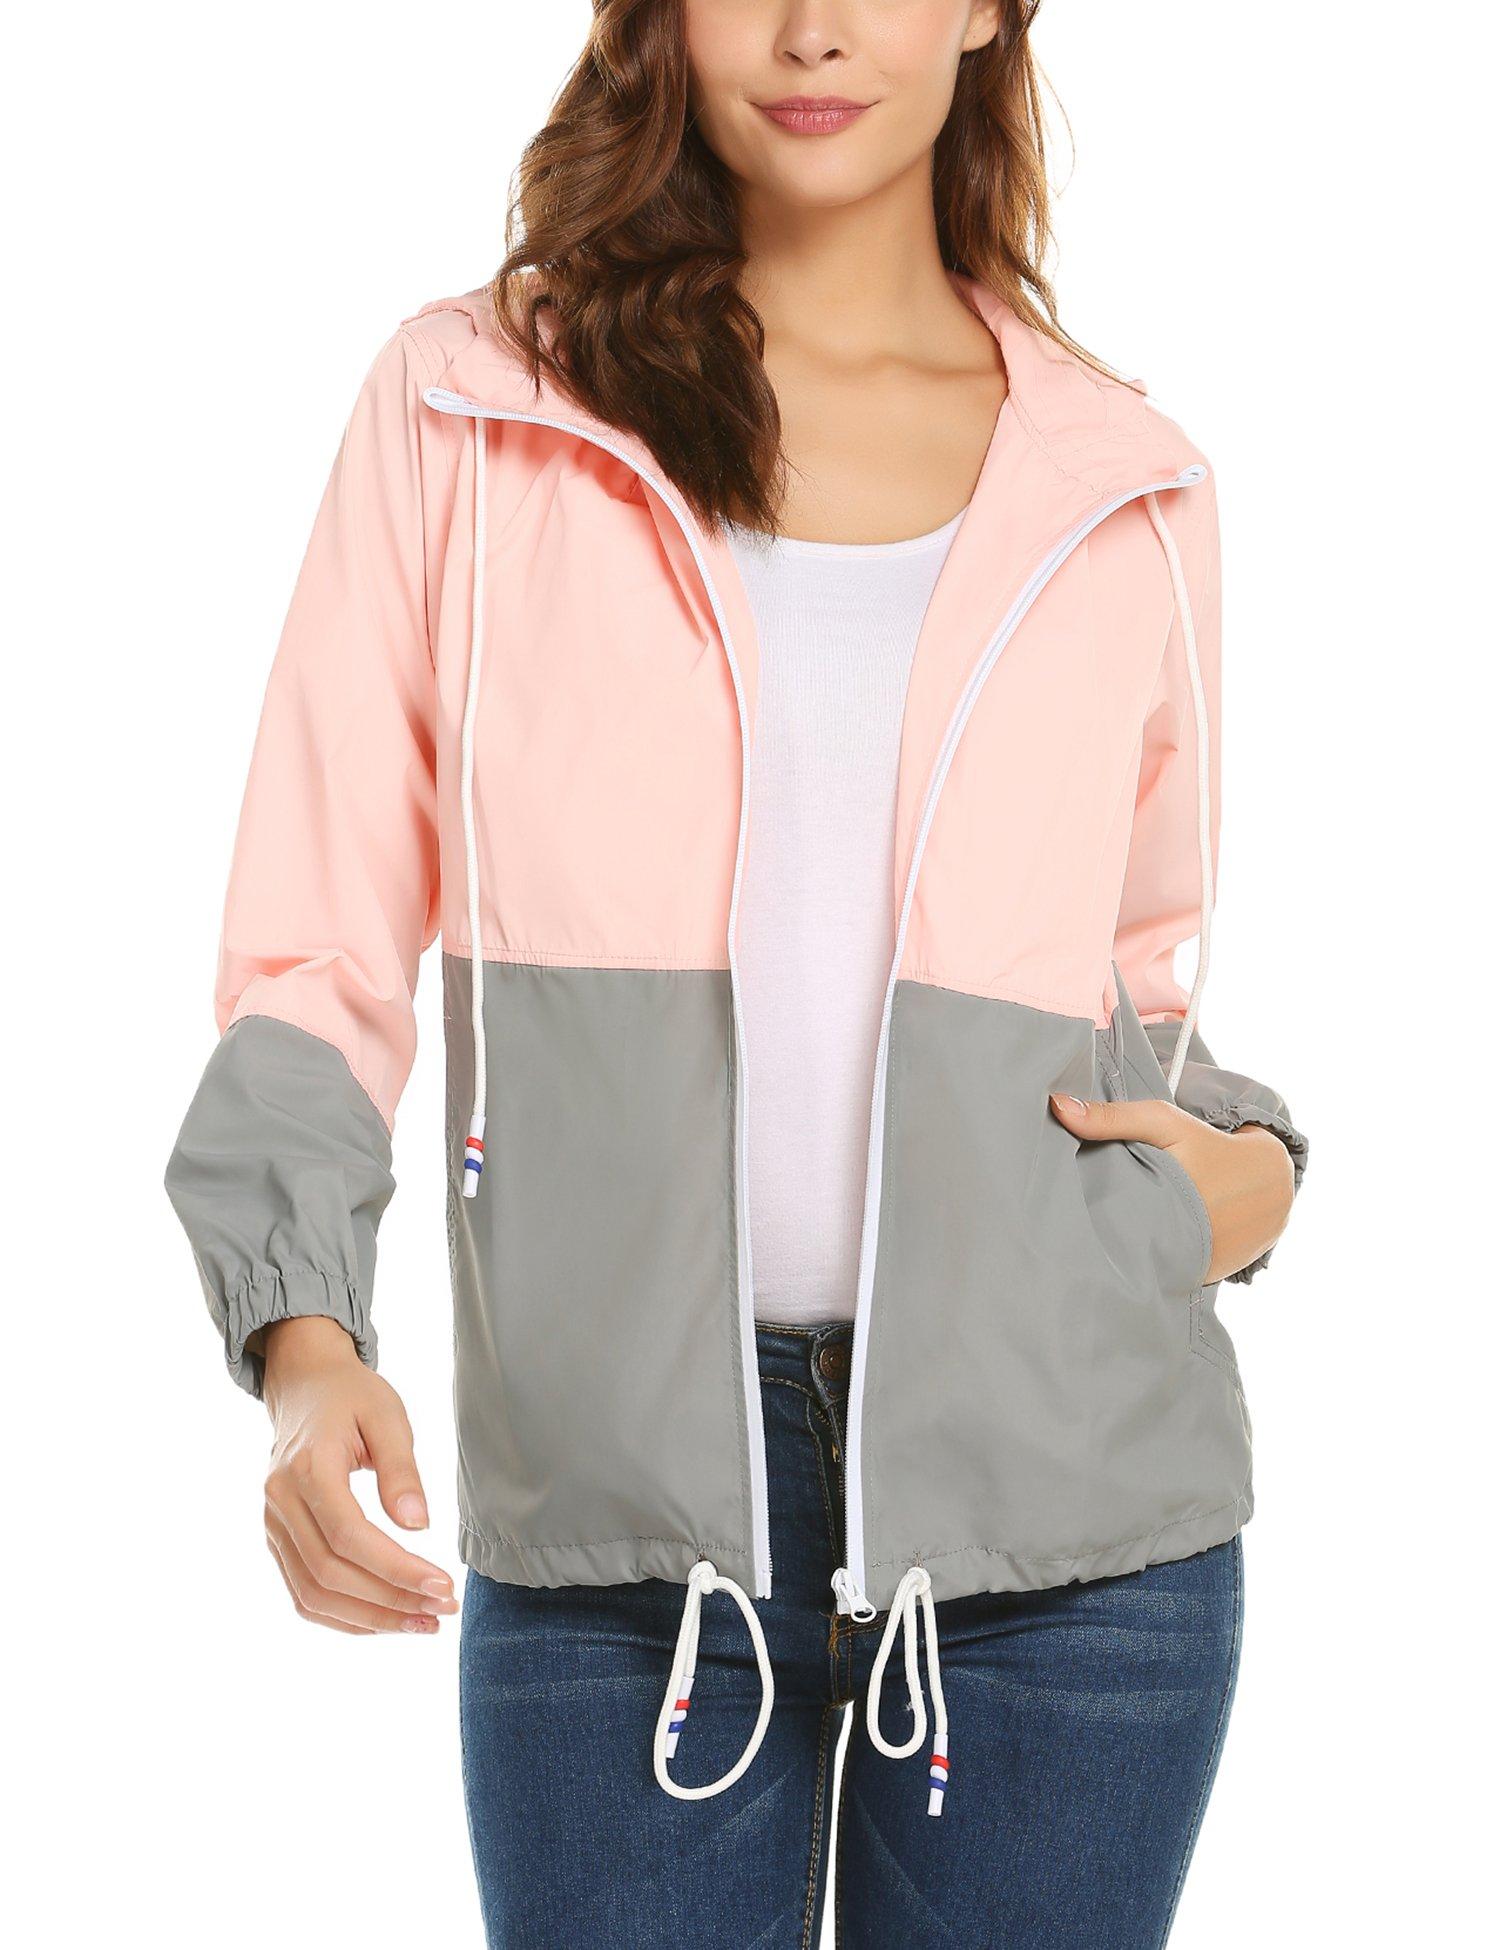 ZHENWEI Women's Lightweight Raincoat Zip up Casual Hoodie Rain Jacket Pink L by ZHENWEI (Image #1)